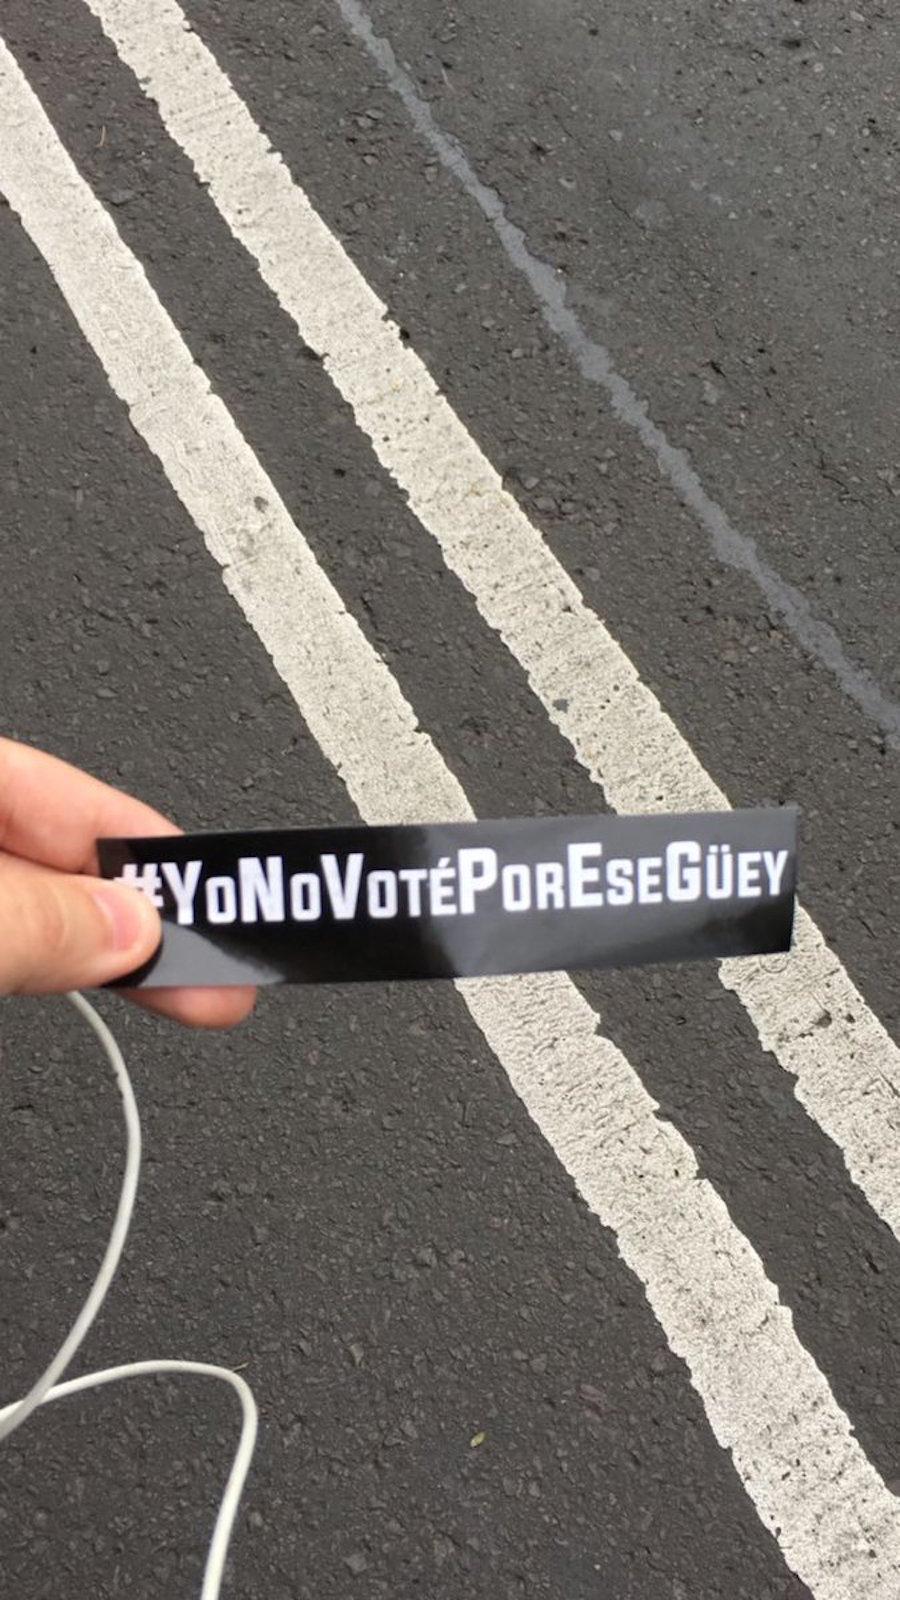 yonovoteporeseguey-pena-nieto-manifestacion-marcha